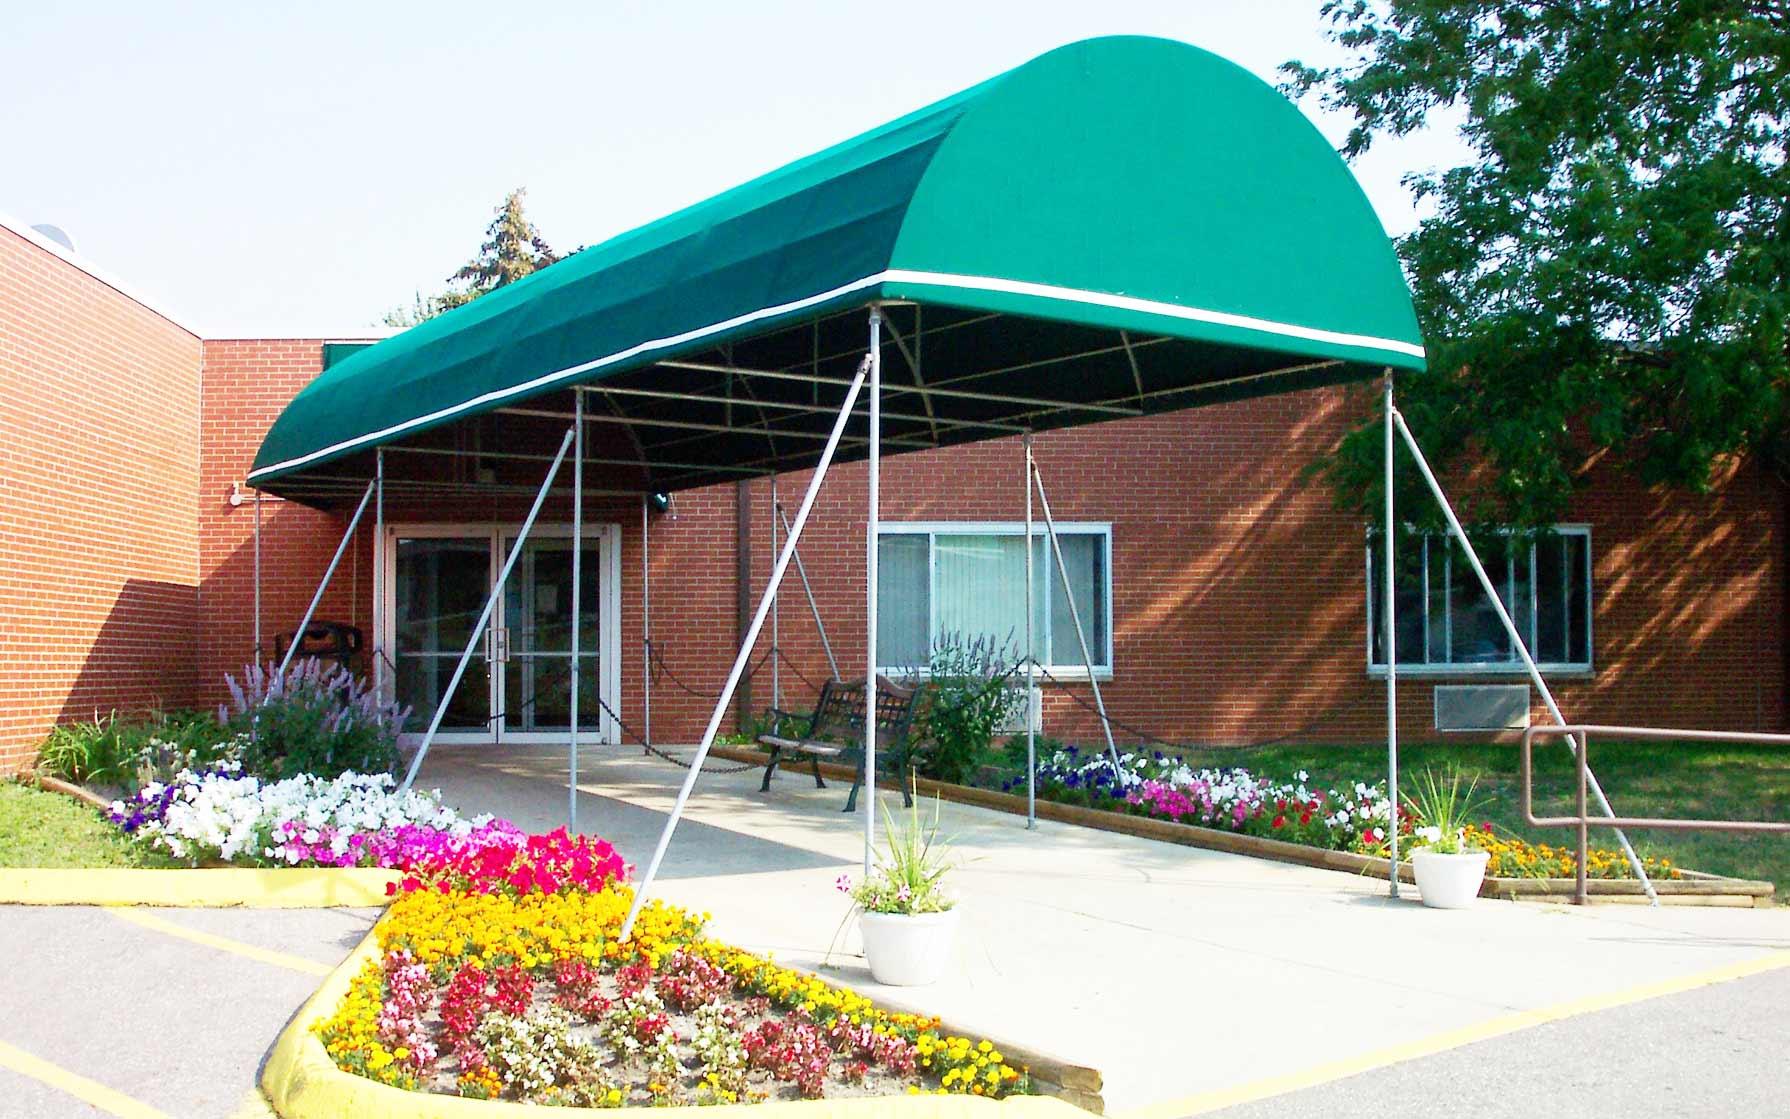 LakePointe Senior Care & Rehab Center | NexCare Managed